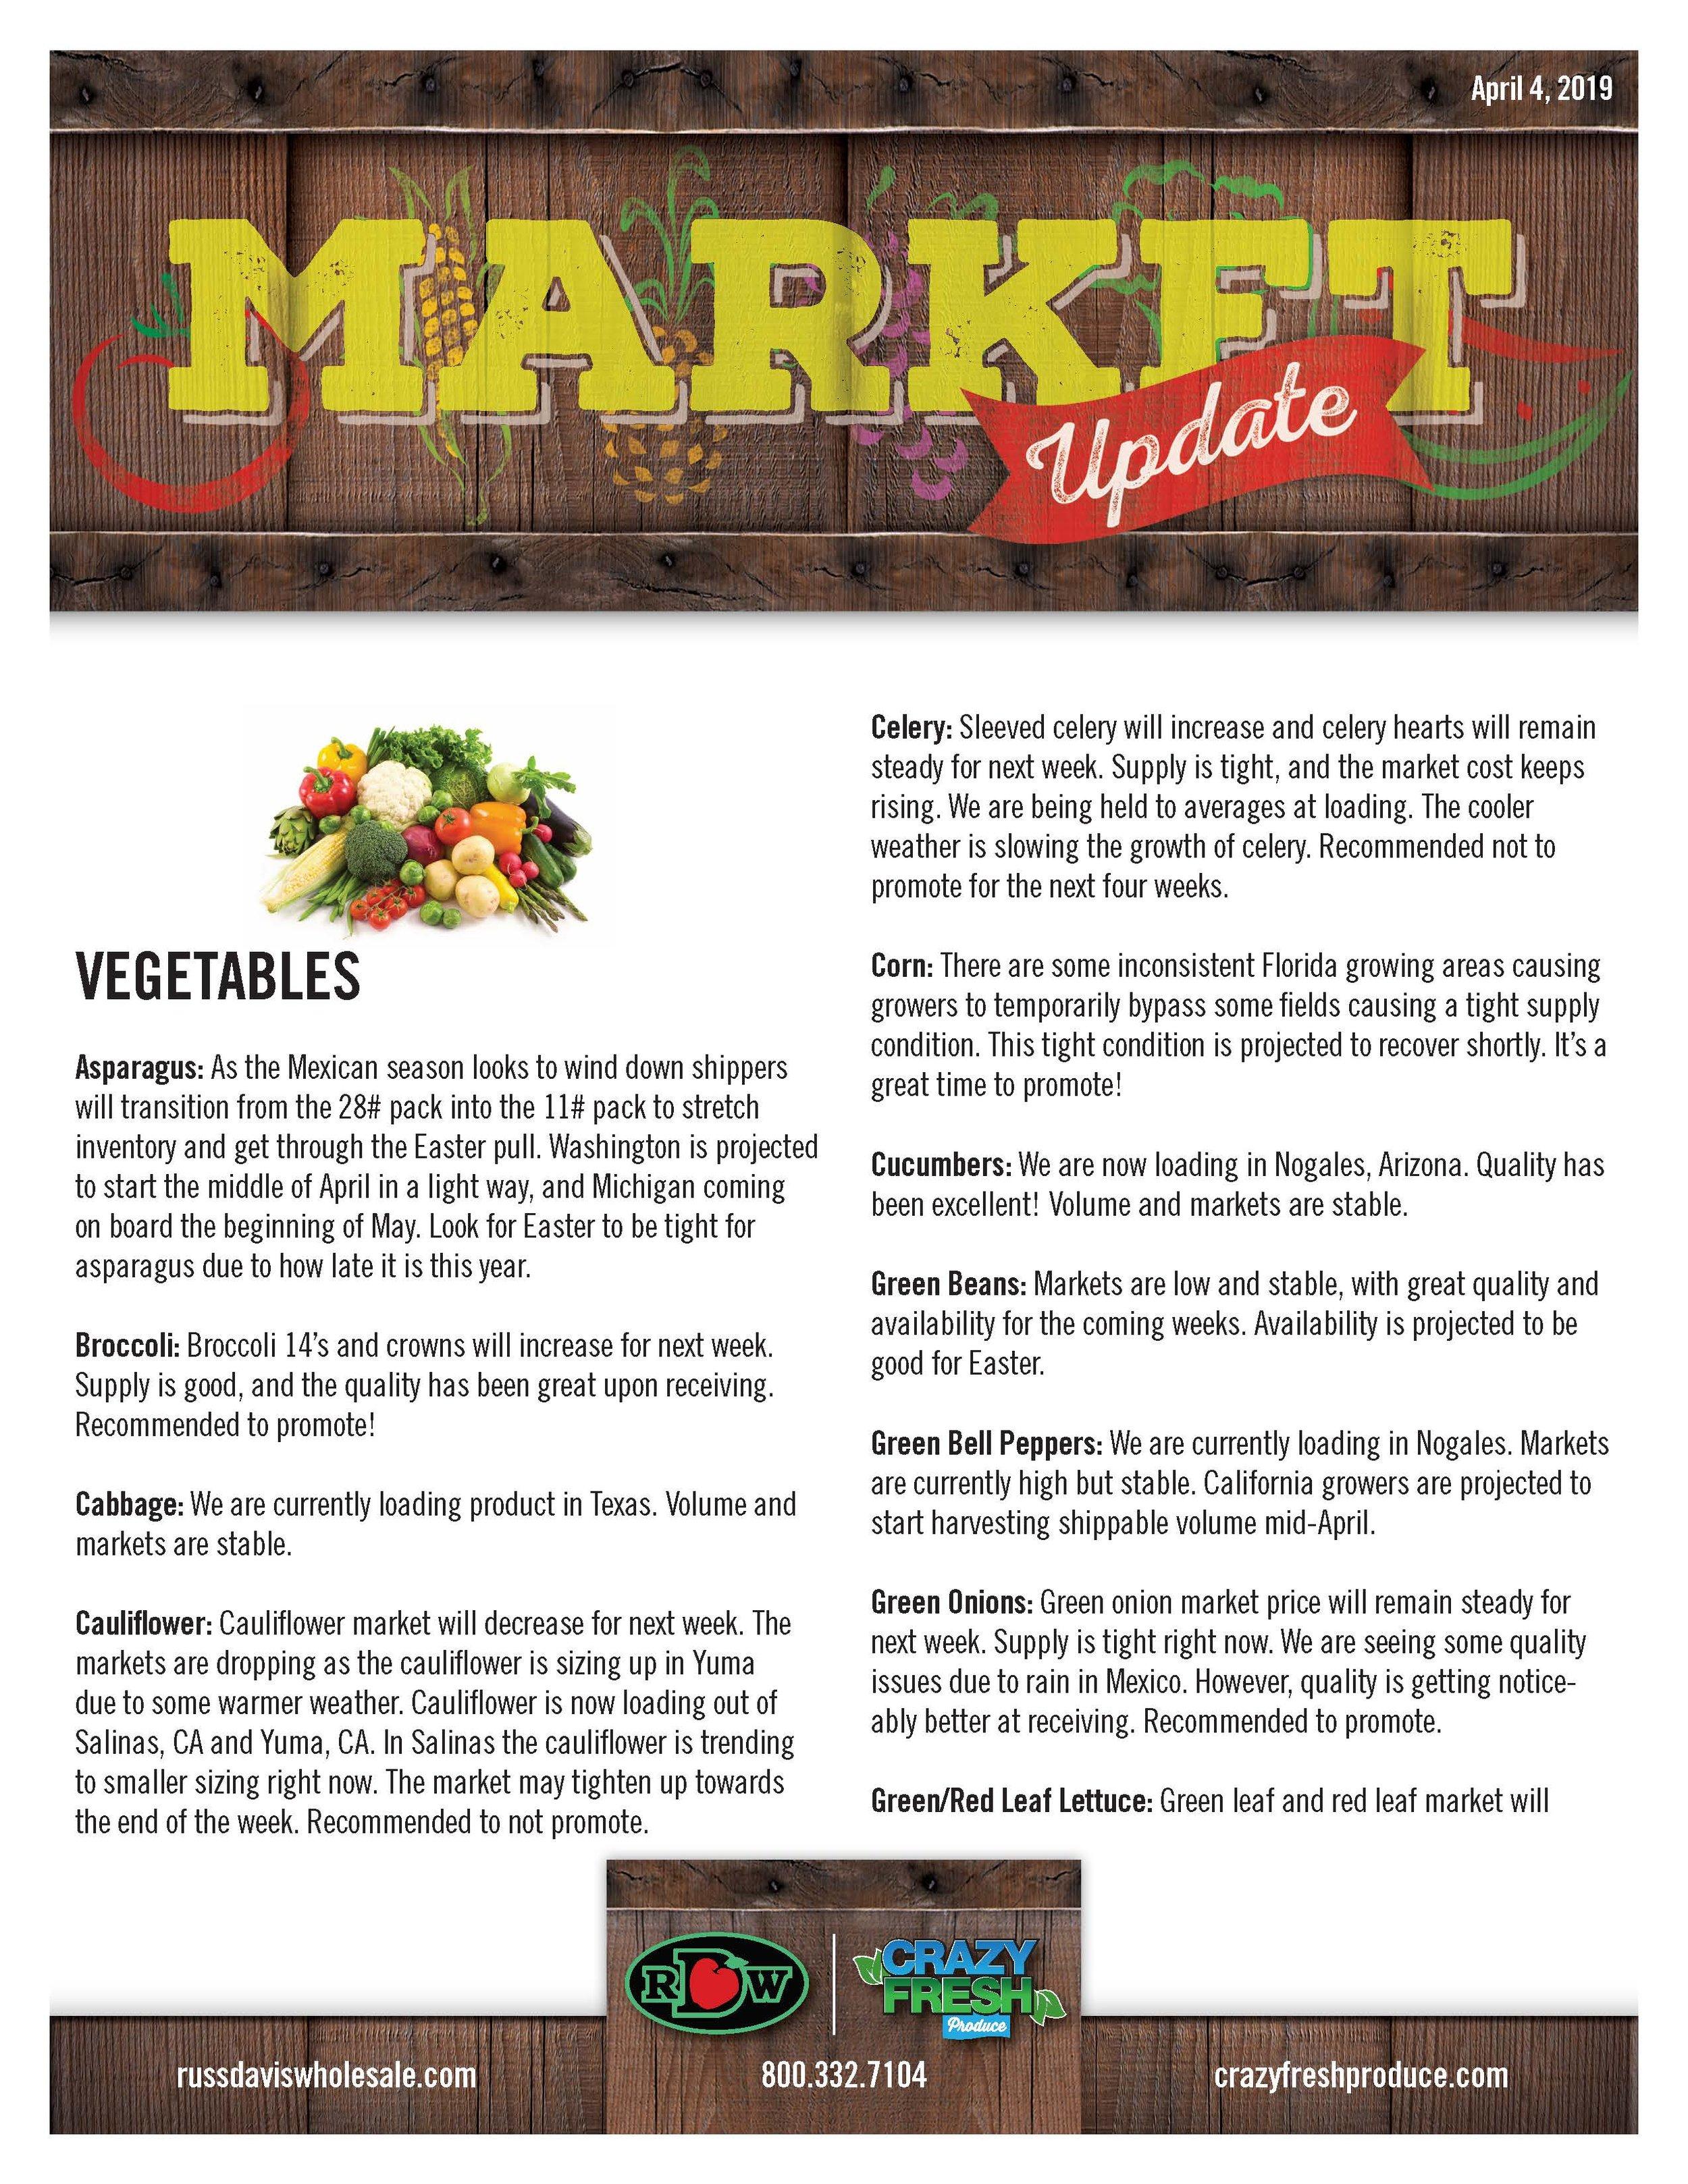 RDW_Market_Update_Apr4_19_Page_1.jpg